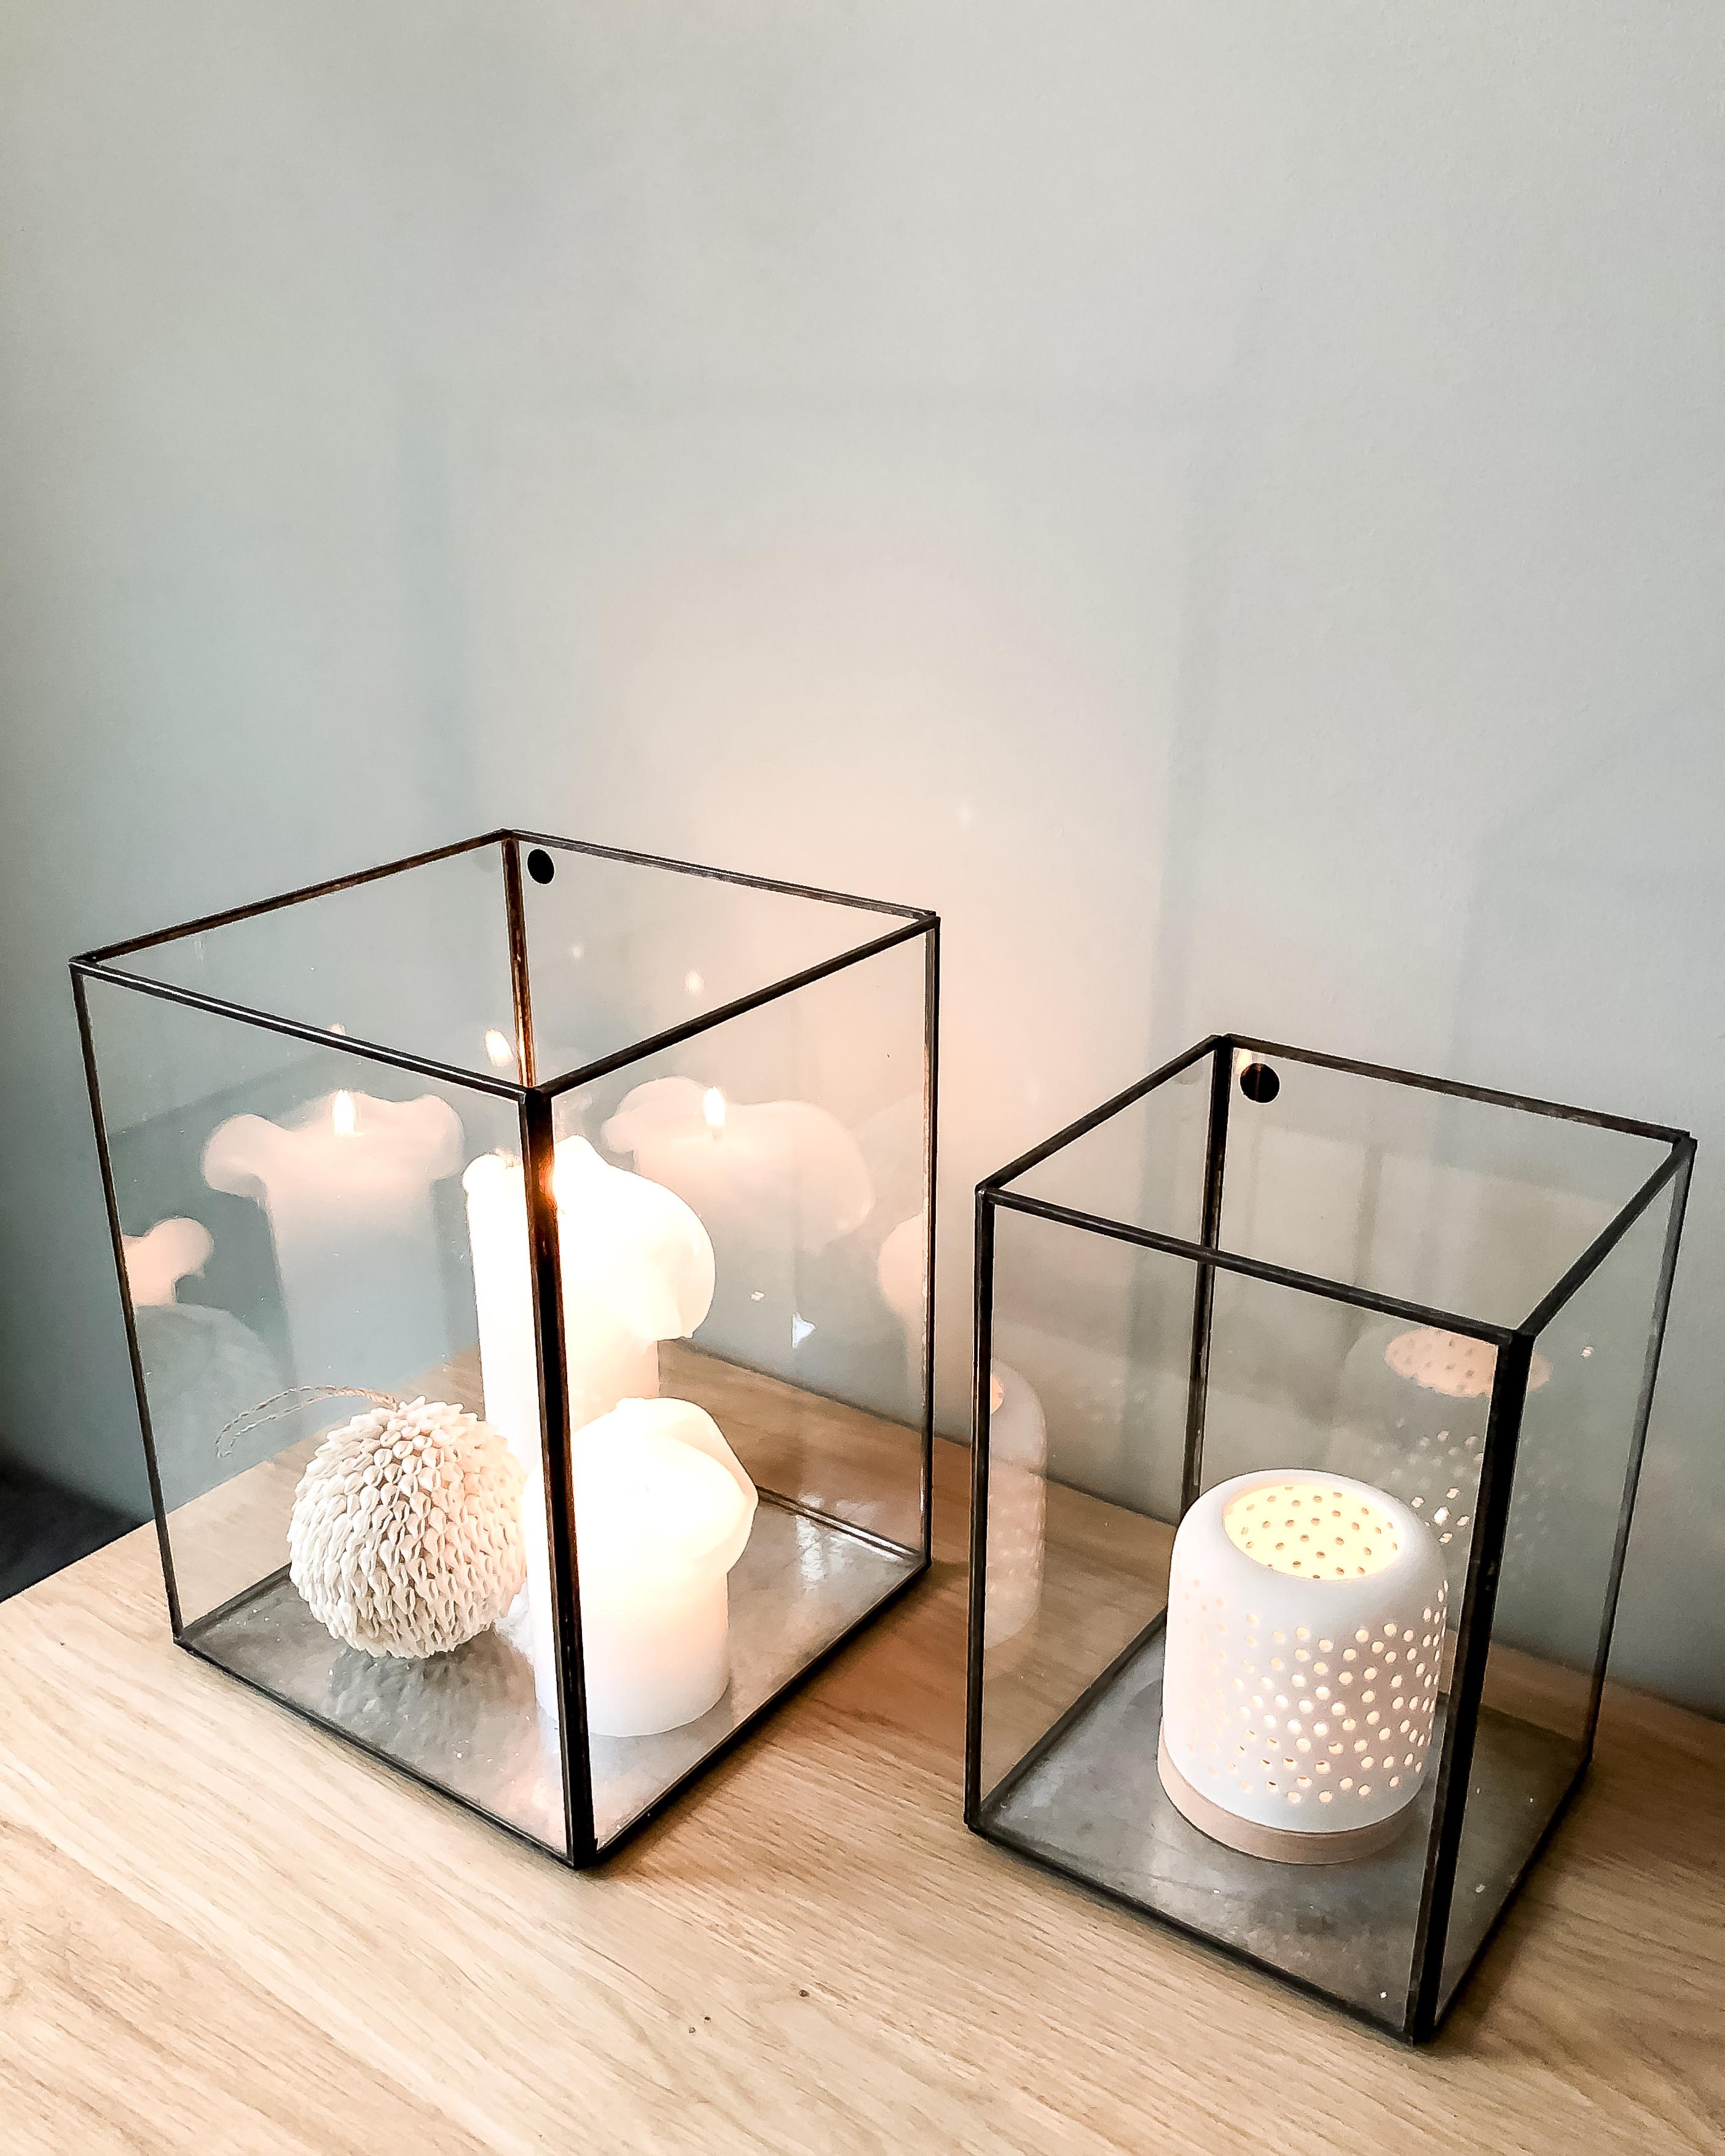 kaarsen in glazen box op wandmeubel